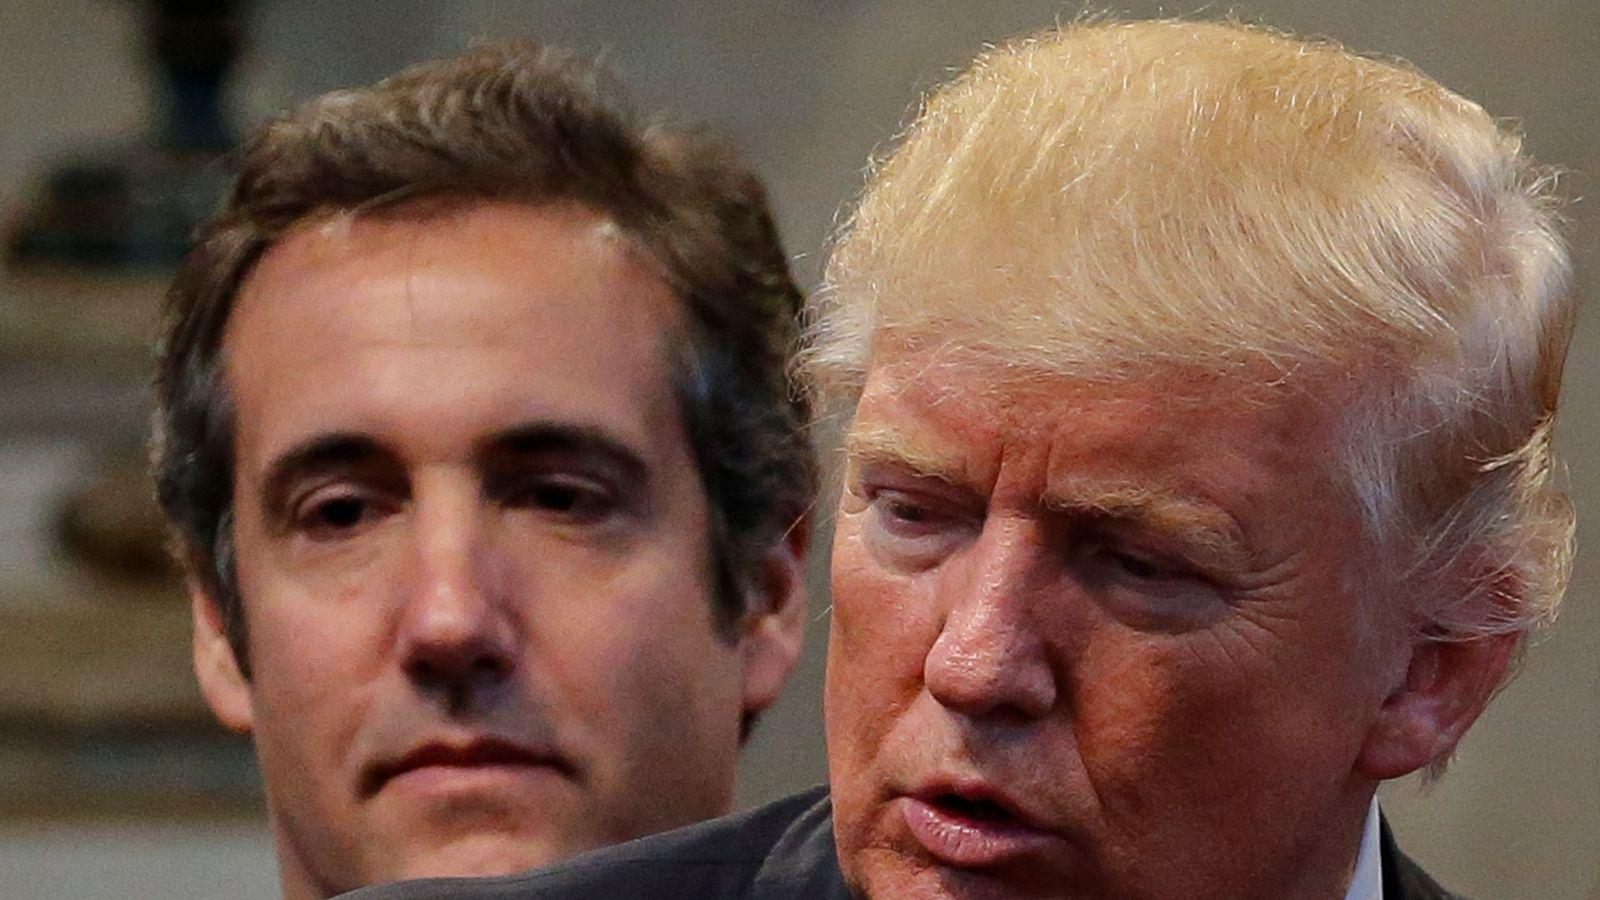 Russia sought Trump meeting in 2015 - Mueller